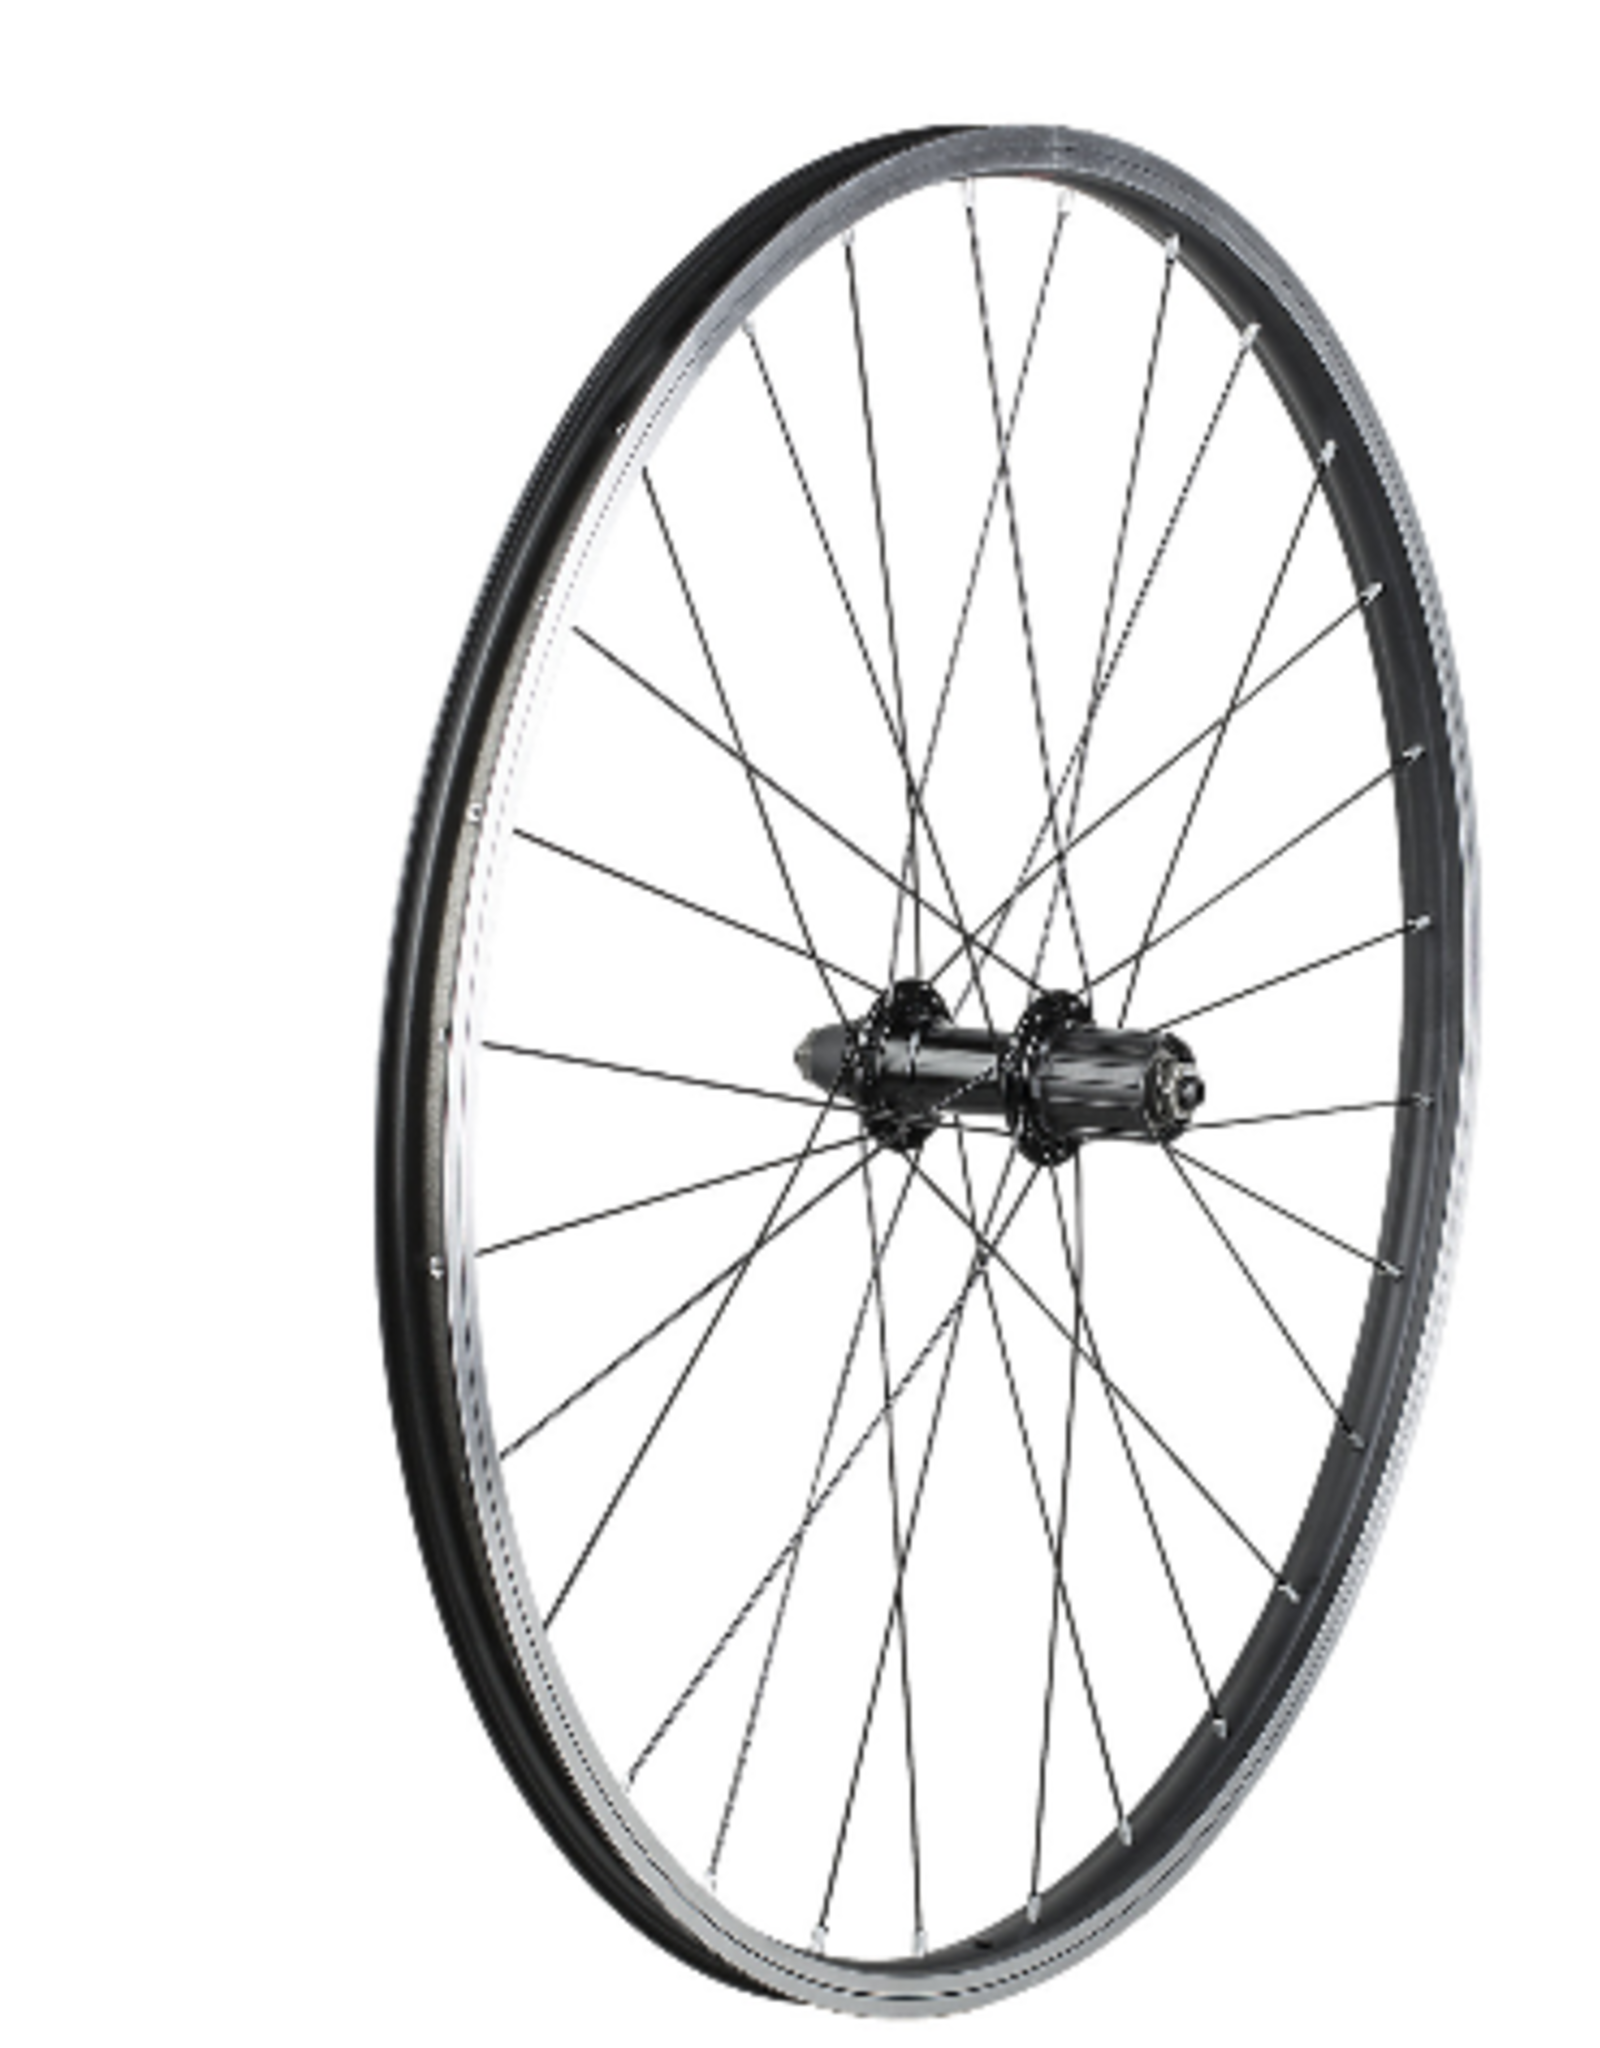 trek Trek Black Rim Brake 26 28H Single Wall QR 8-Speed Rear Wheel